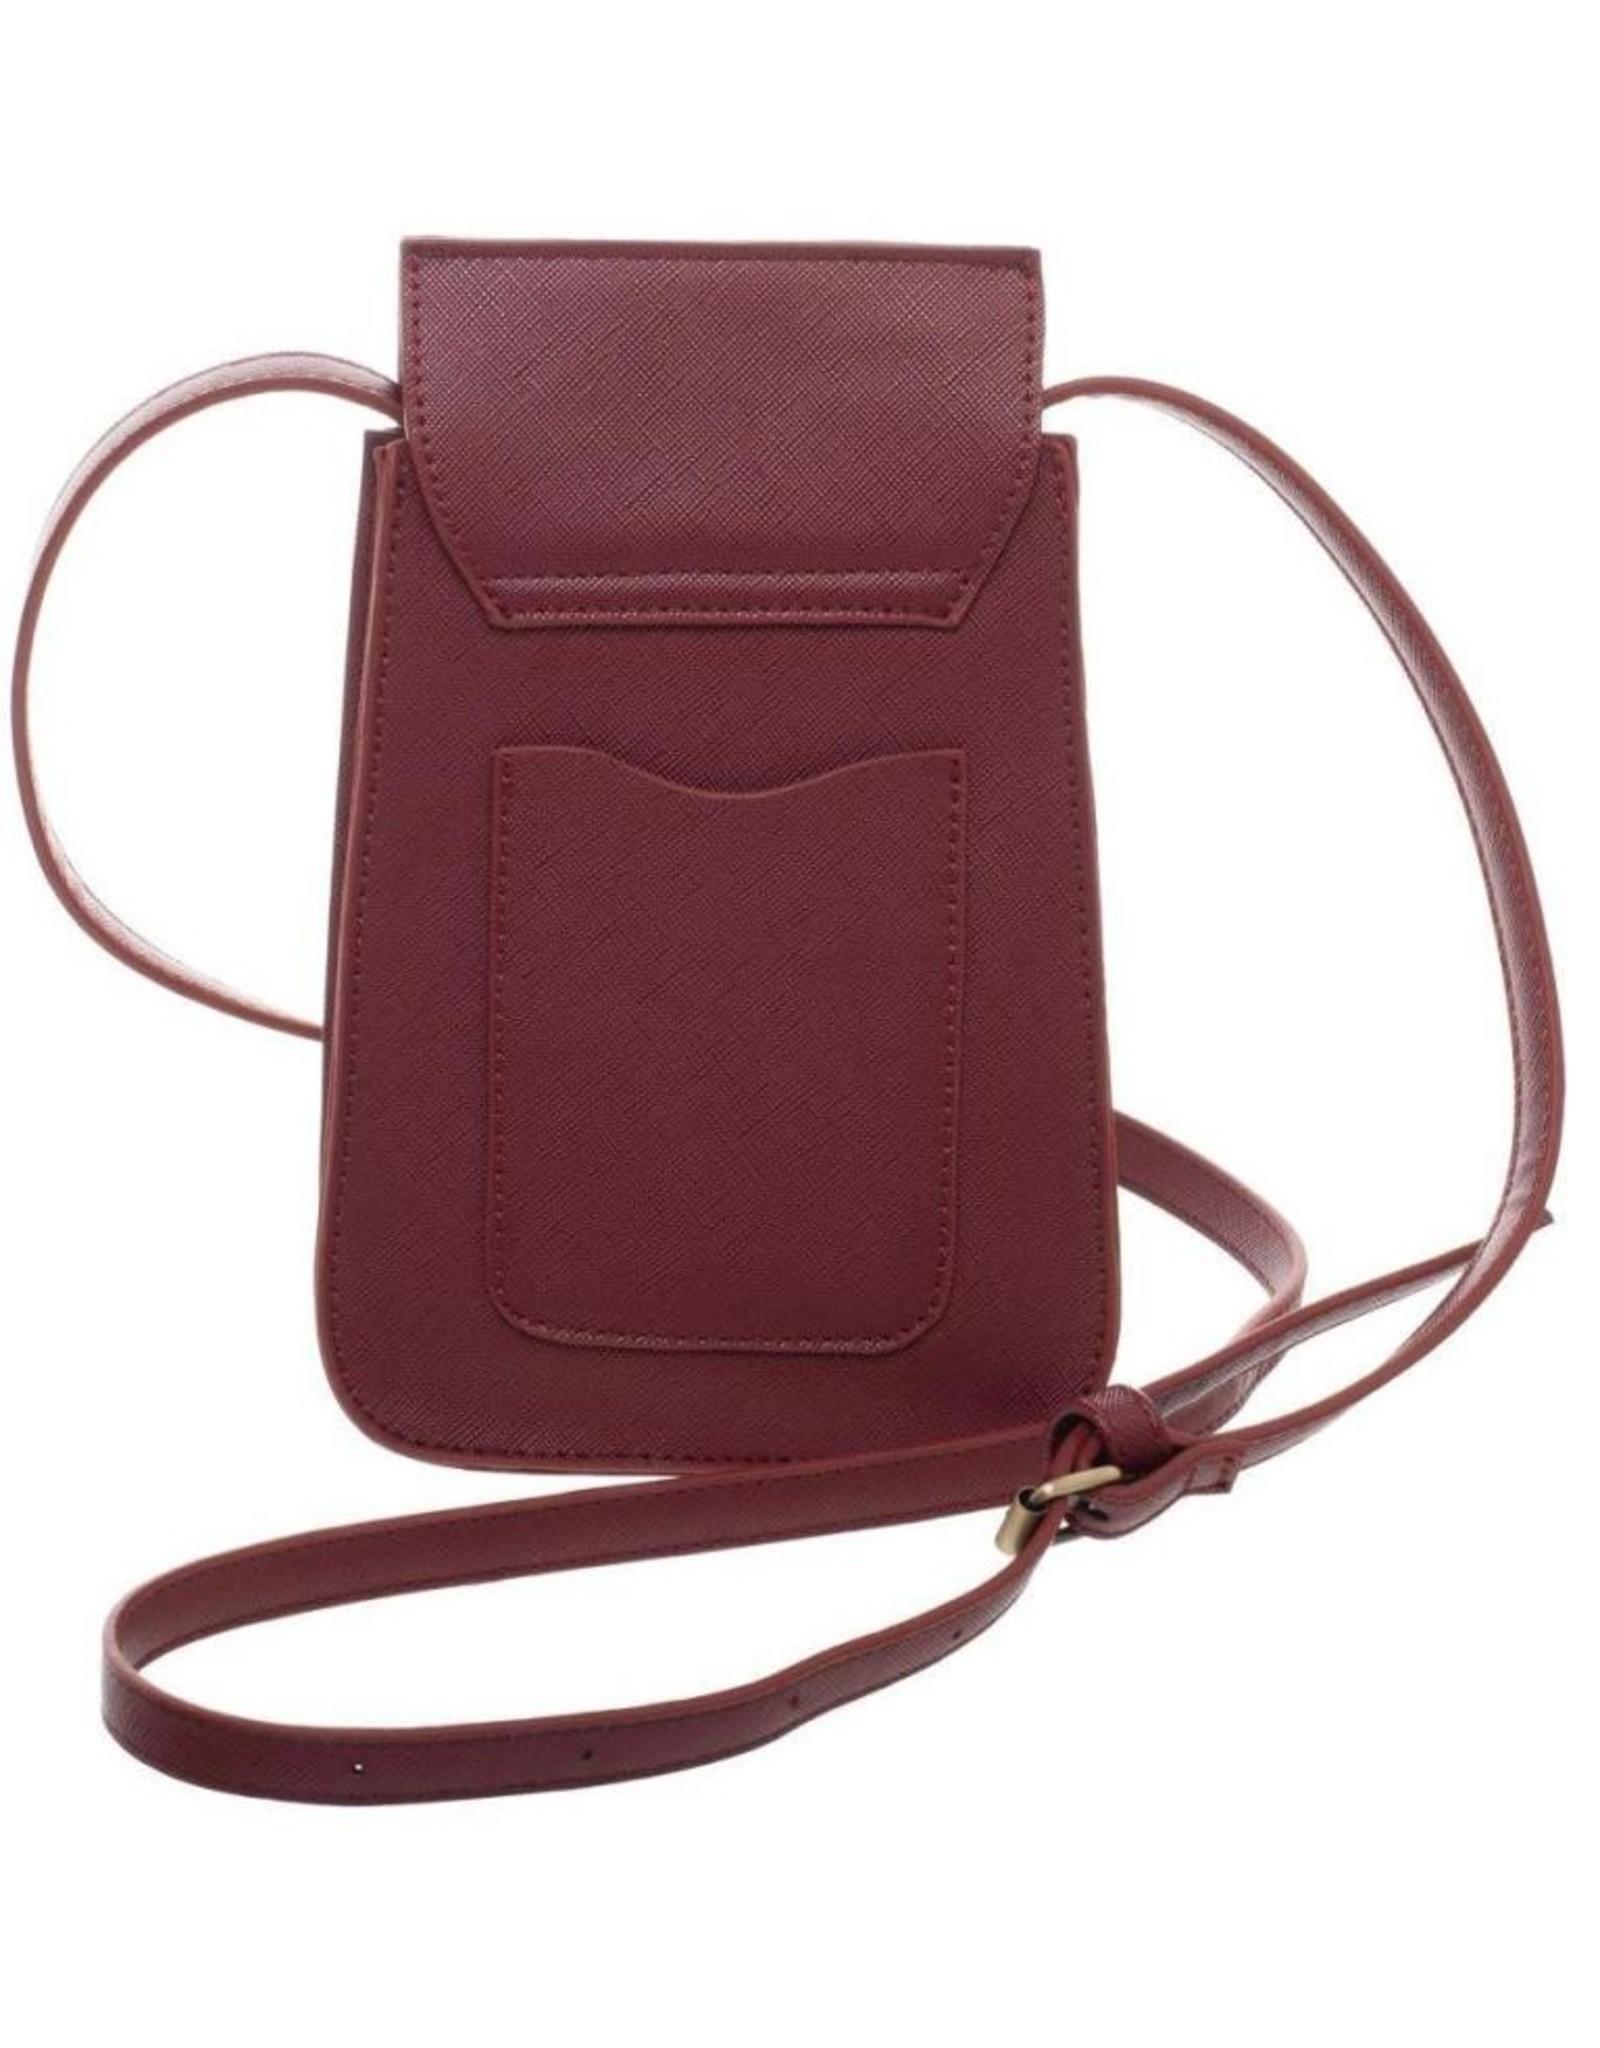 Trukado Harry Potter tassen en portemonnees - Harry Potter Golden Snitch crossbody tas